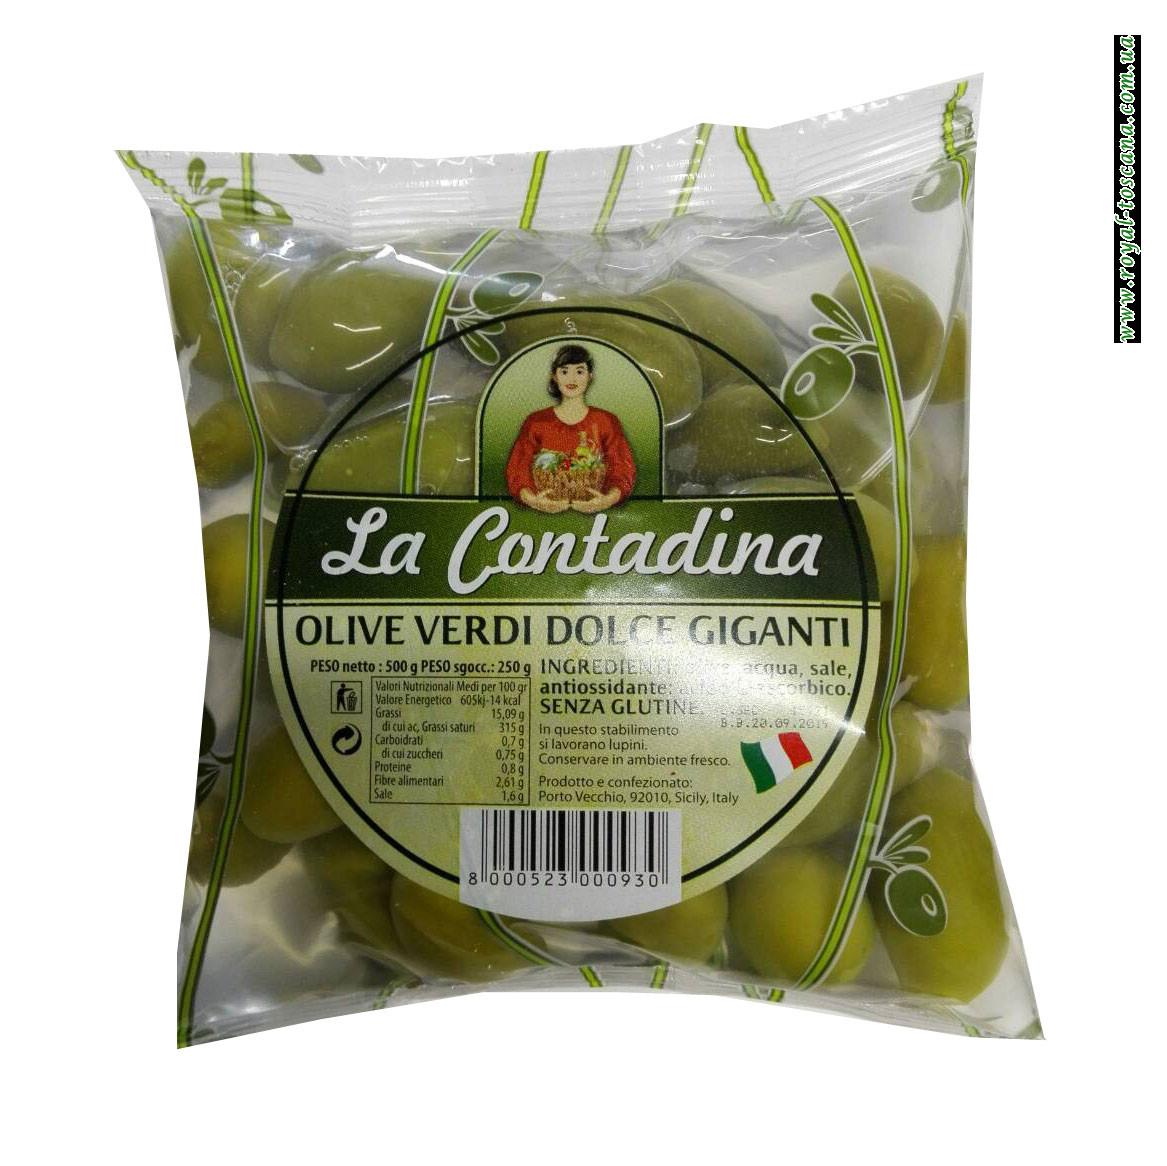 Оливки зеленые Contadina Olive Verdi Dolce Giganti